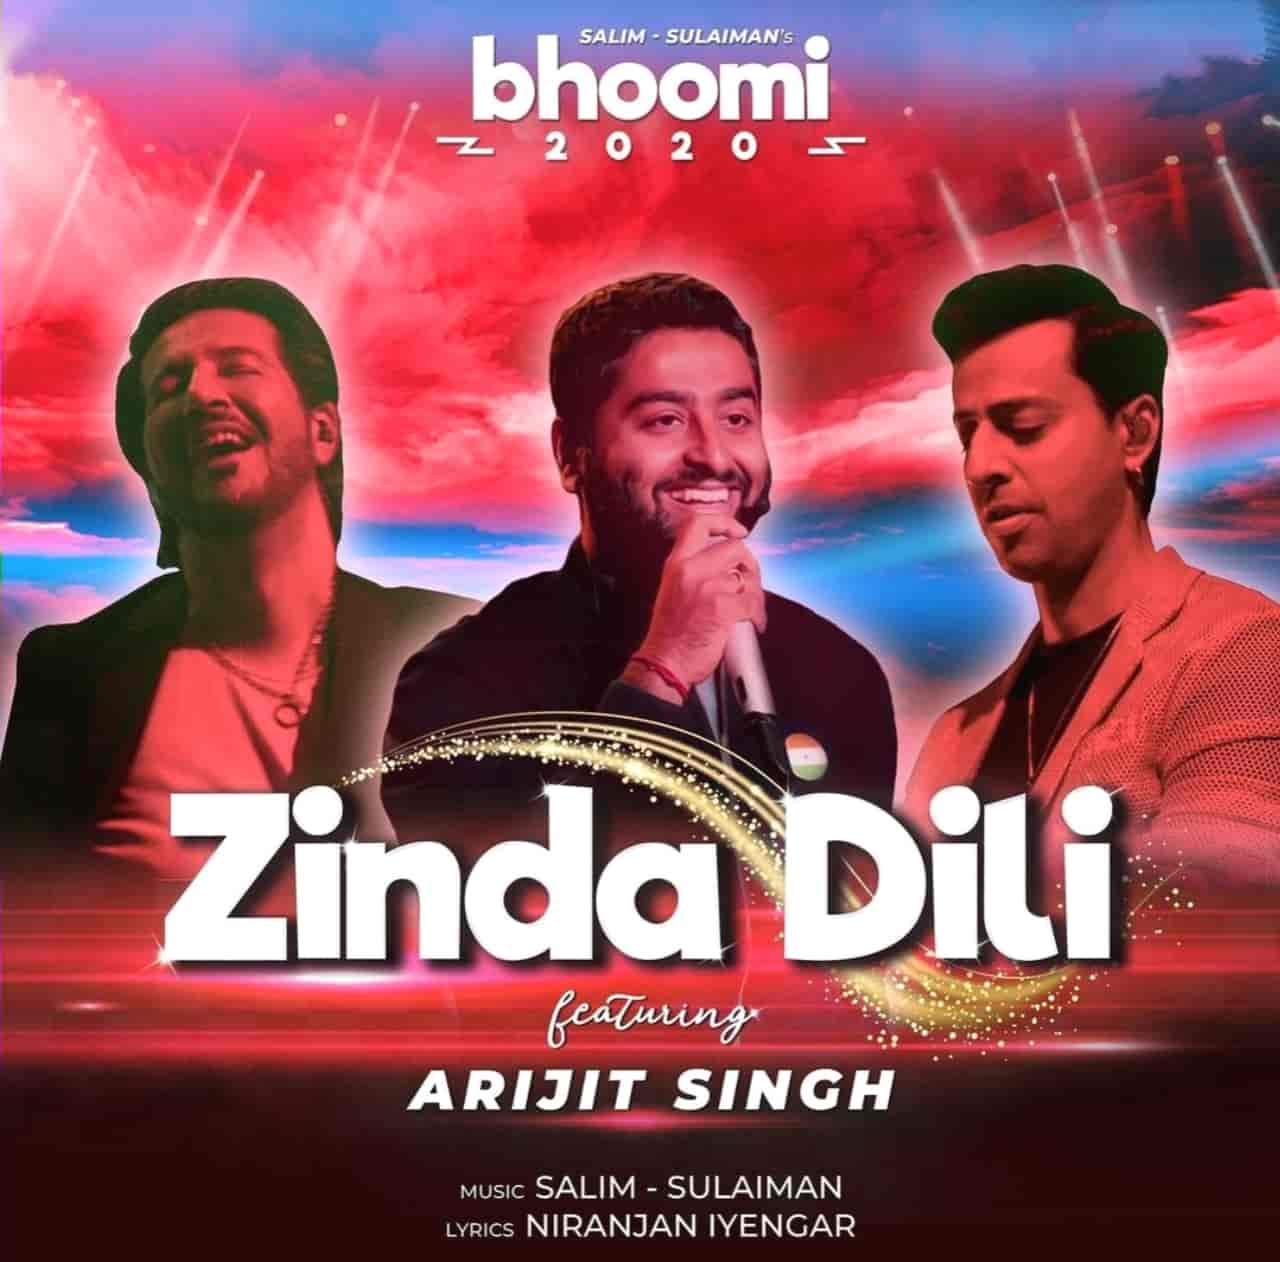 Zinda Dili Hindi Song Image Features Arijit Singh